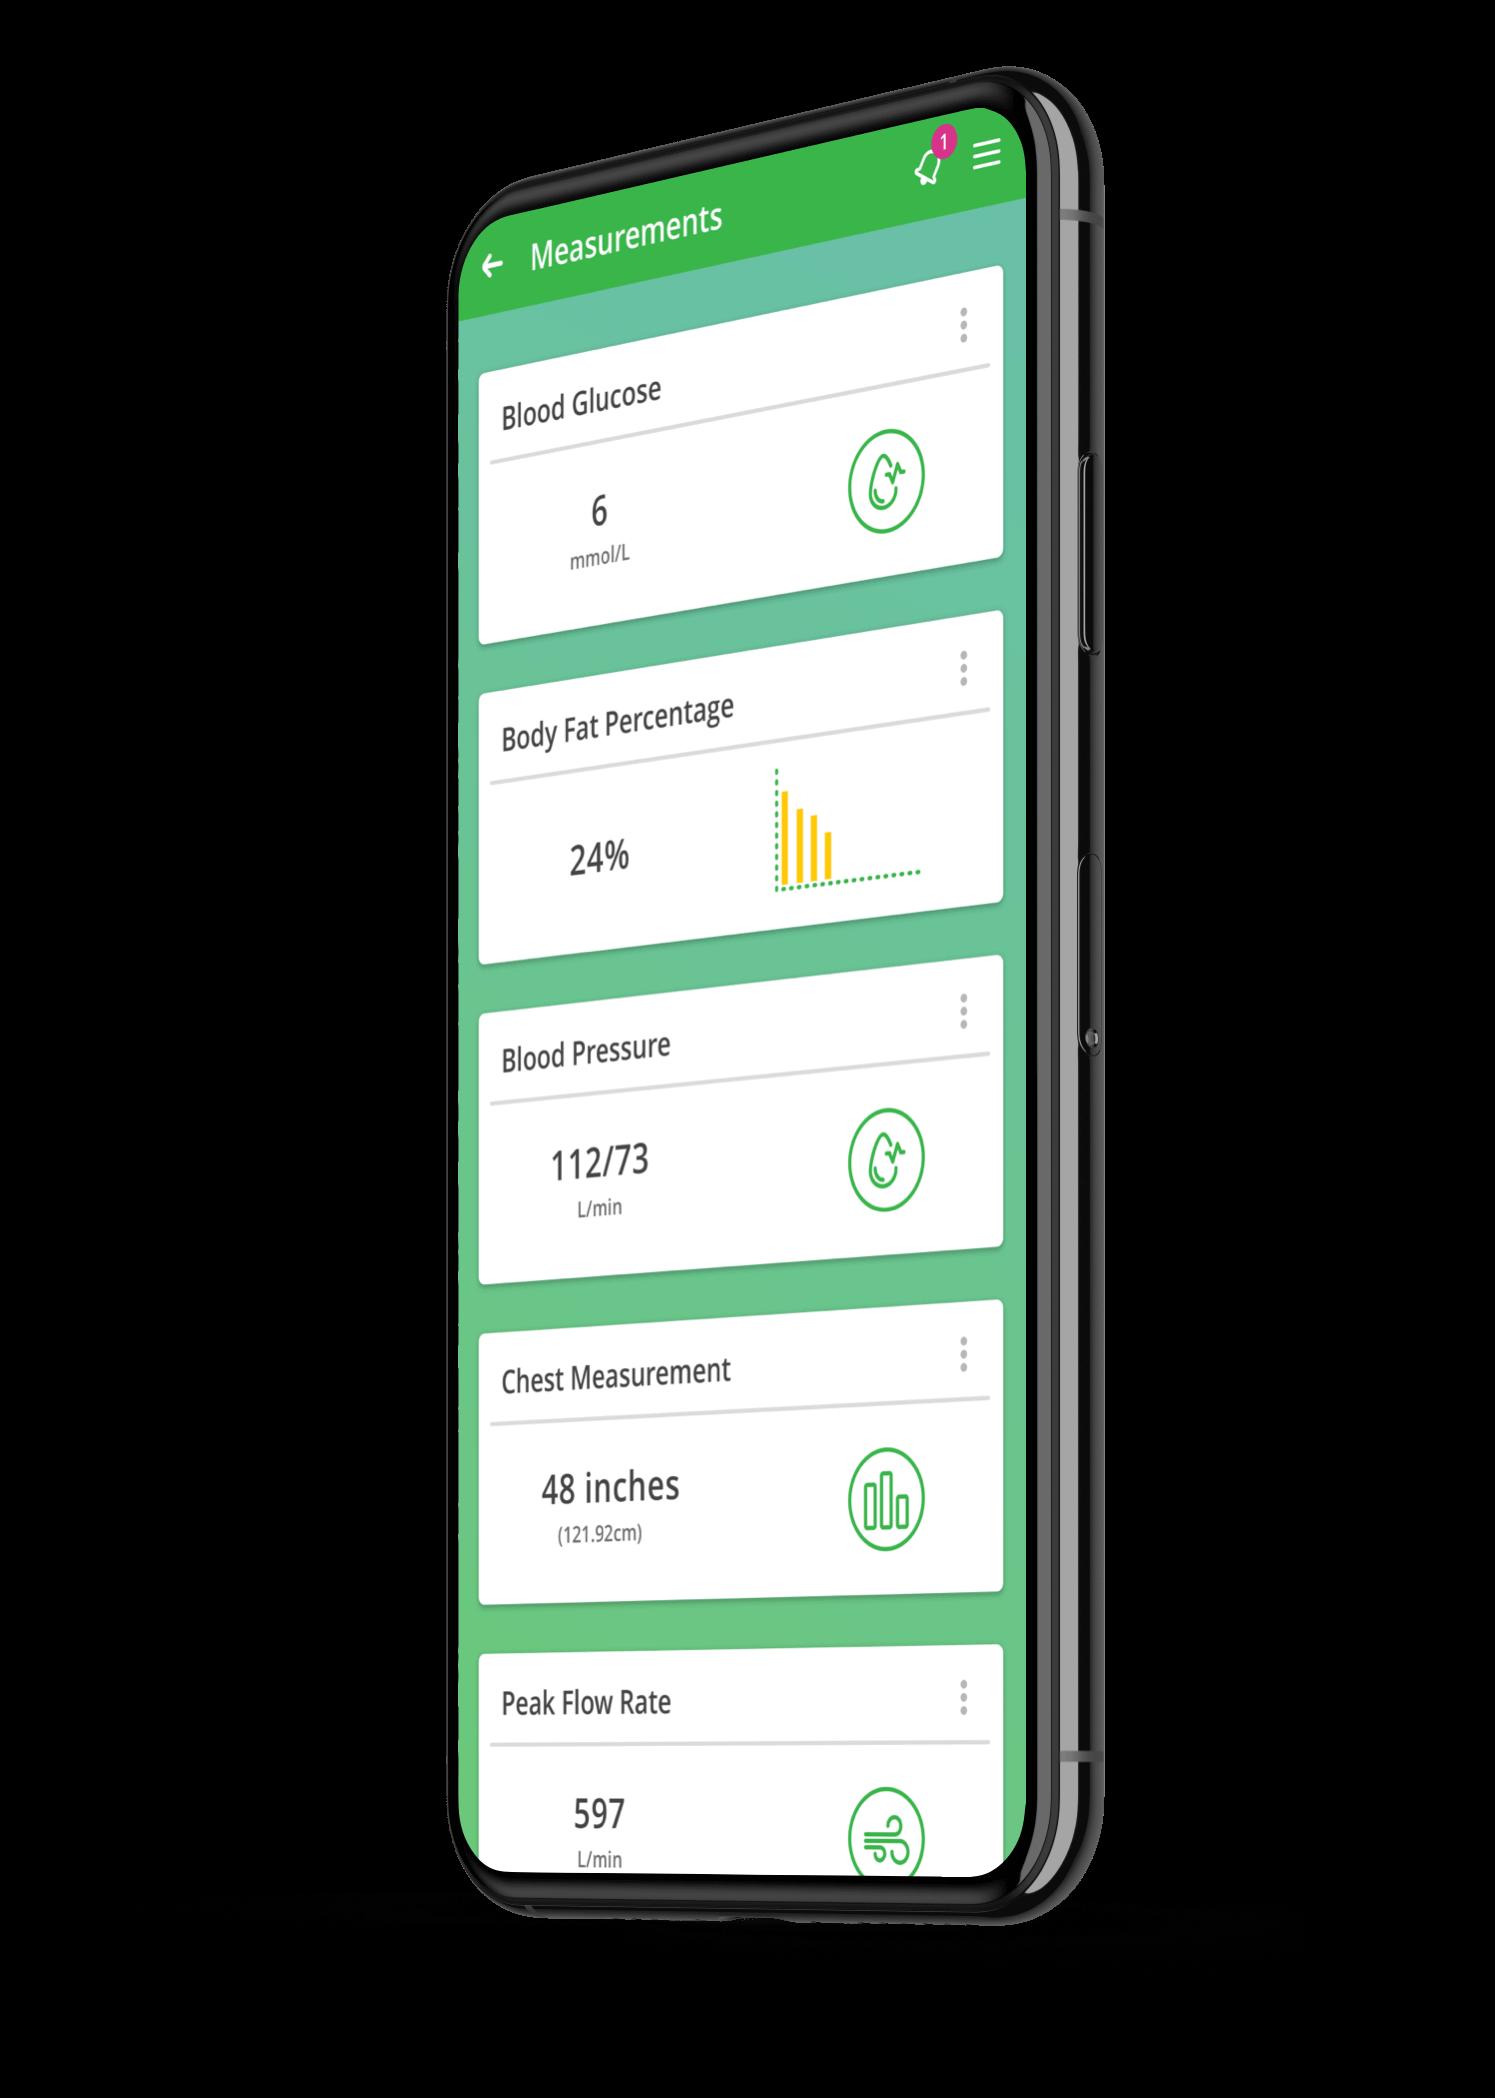 App screenshot of tracked measurements